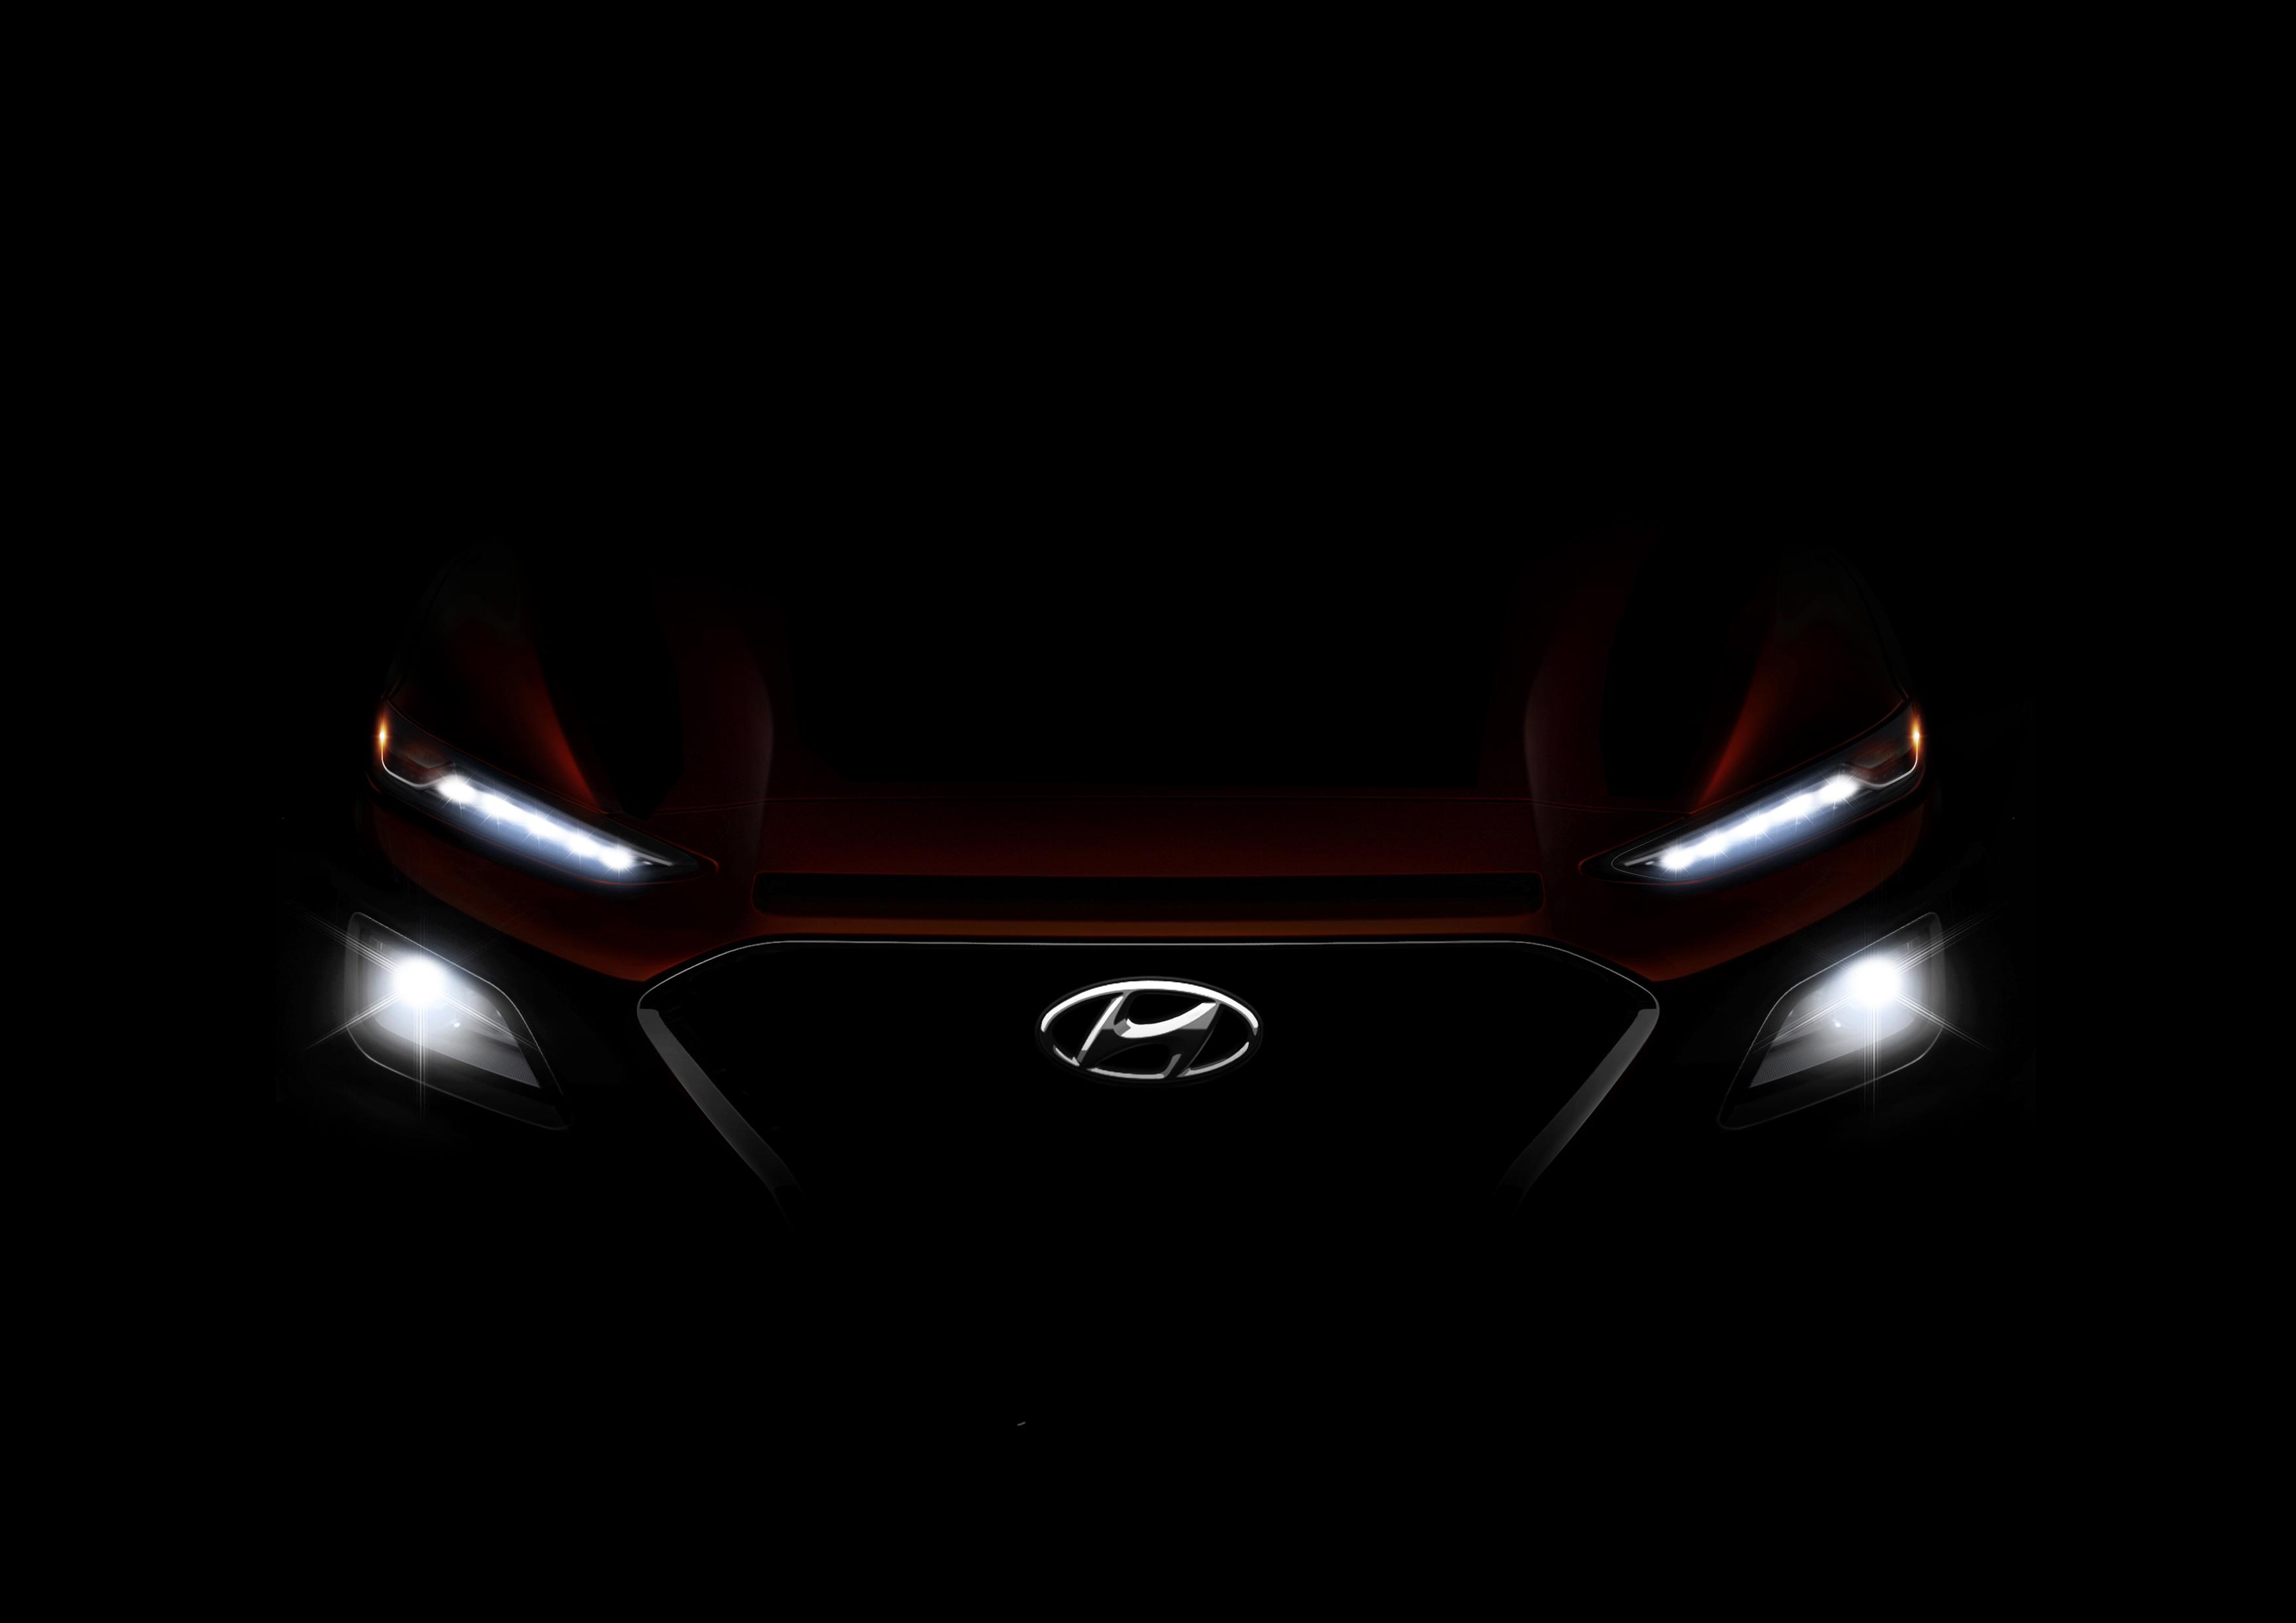 De nieuwe Hyundai KONA: scherp en vernieuwend